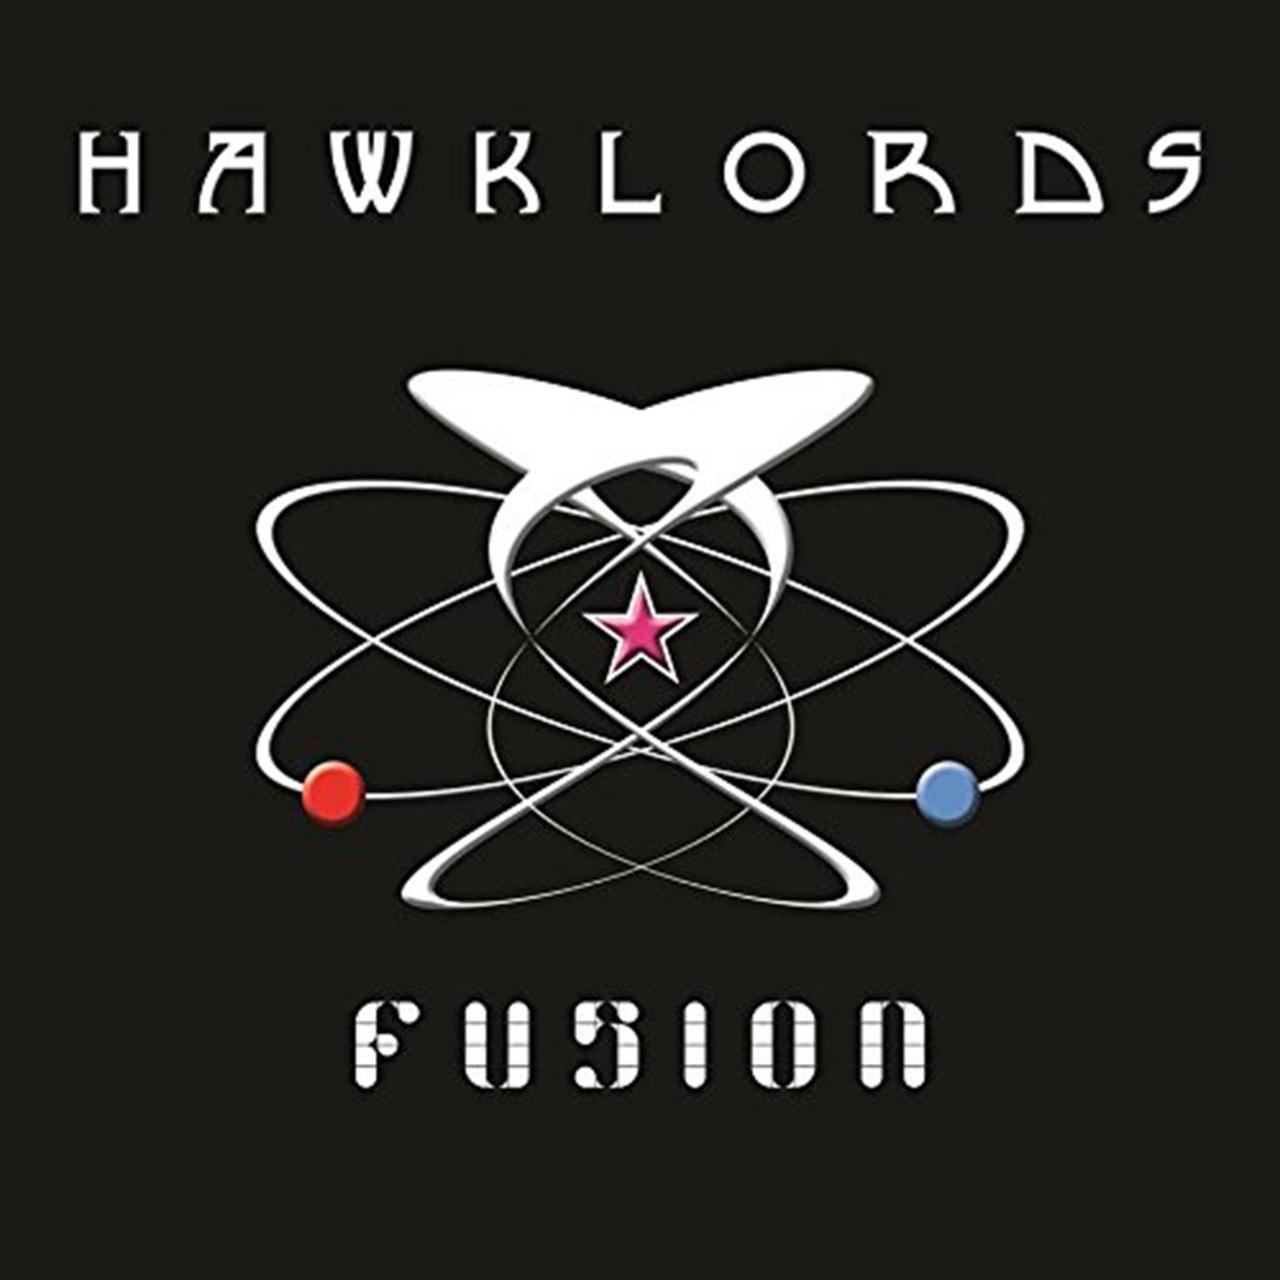 Fusion - 1